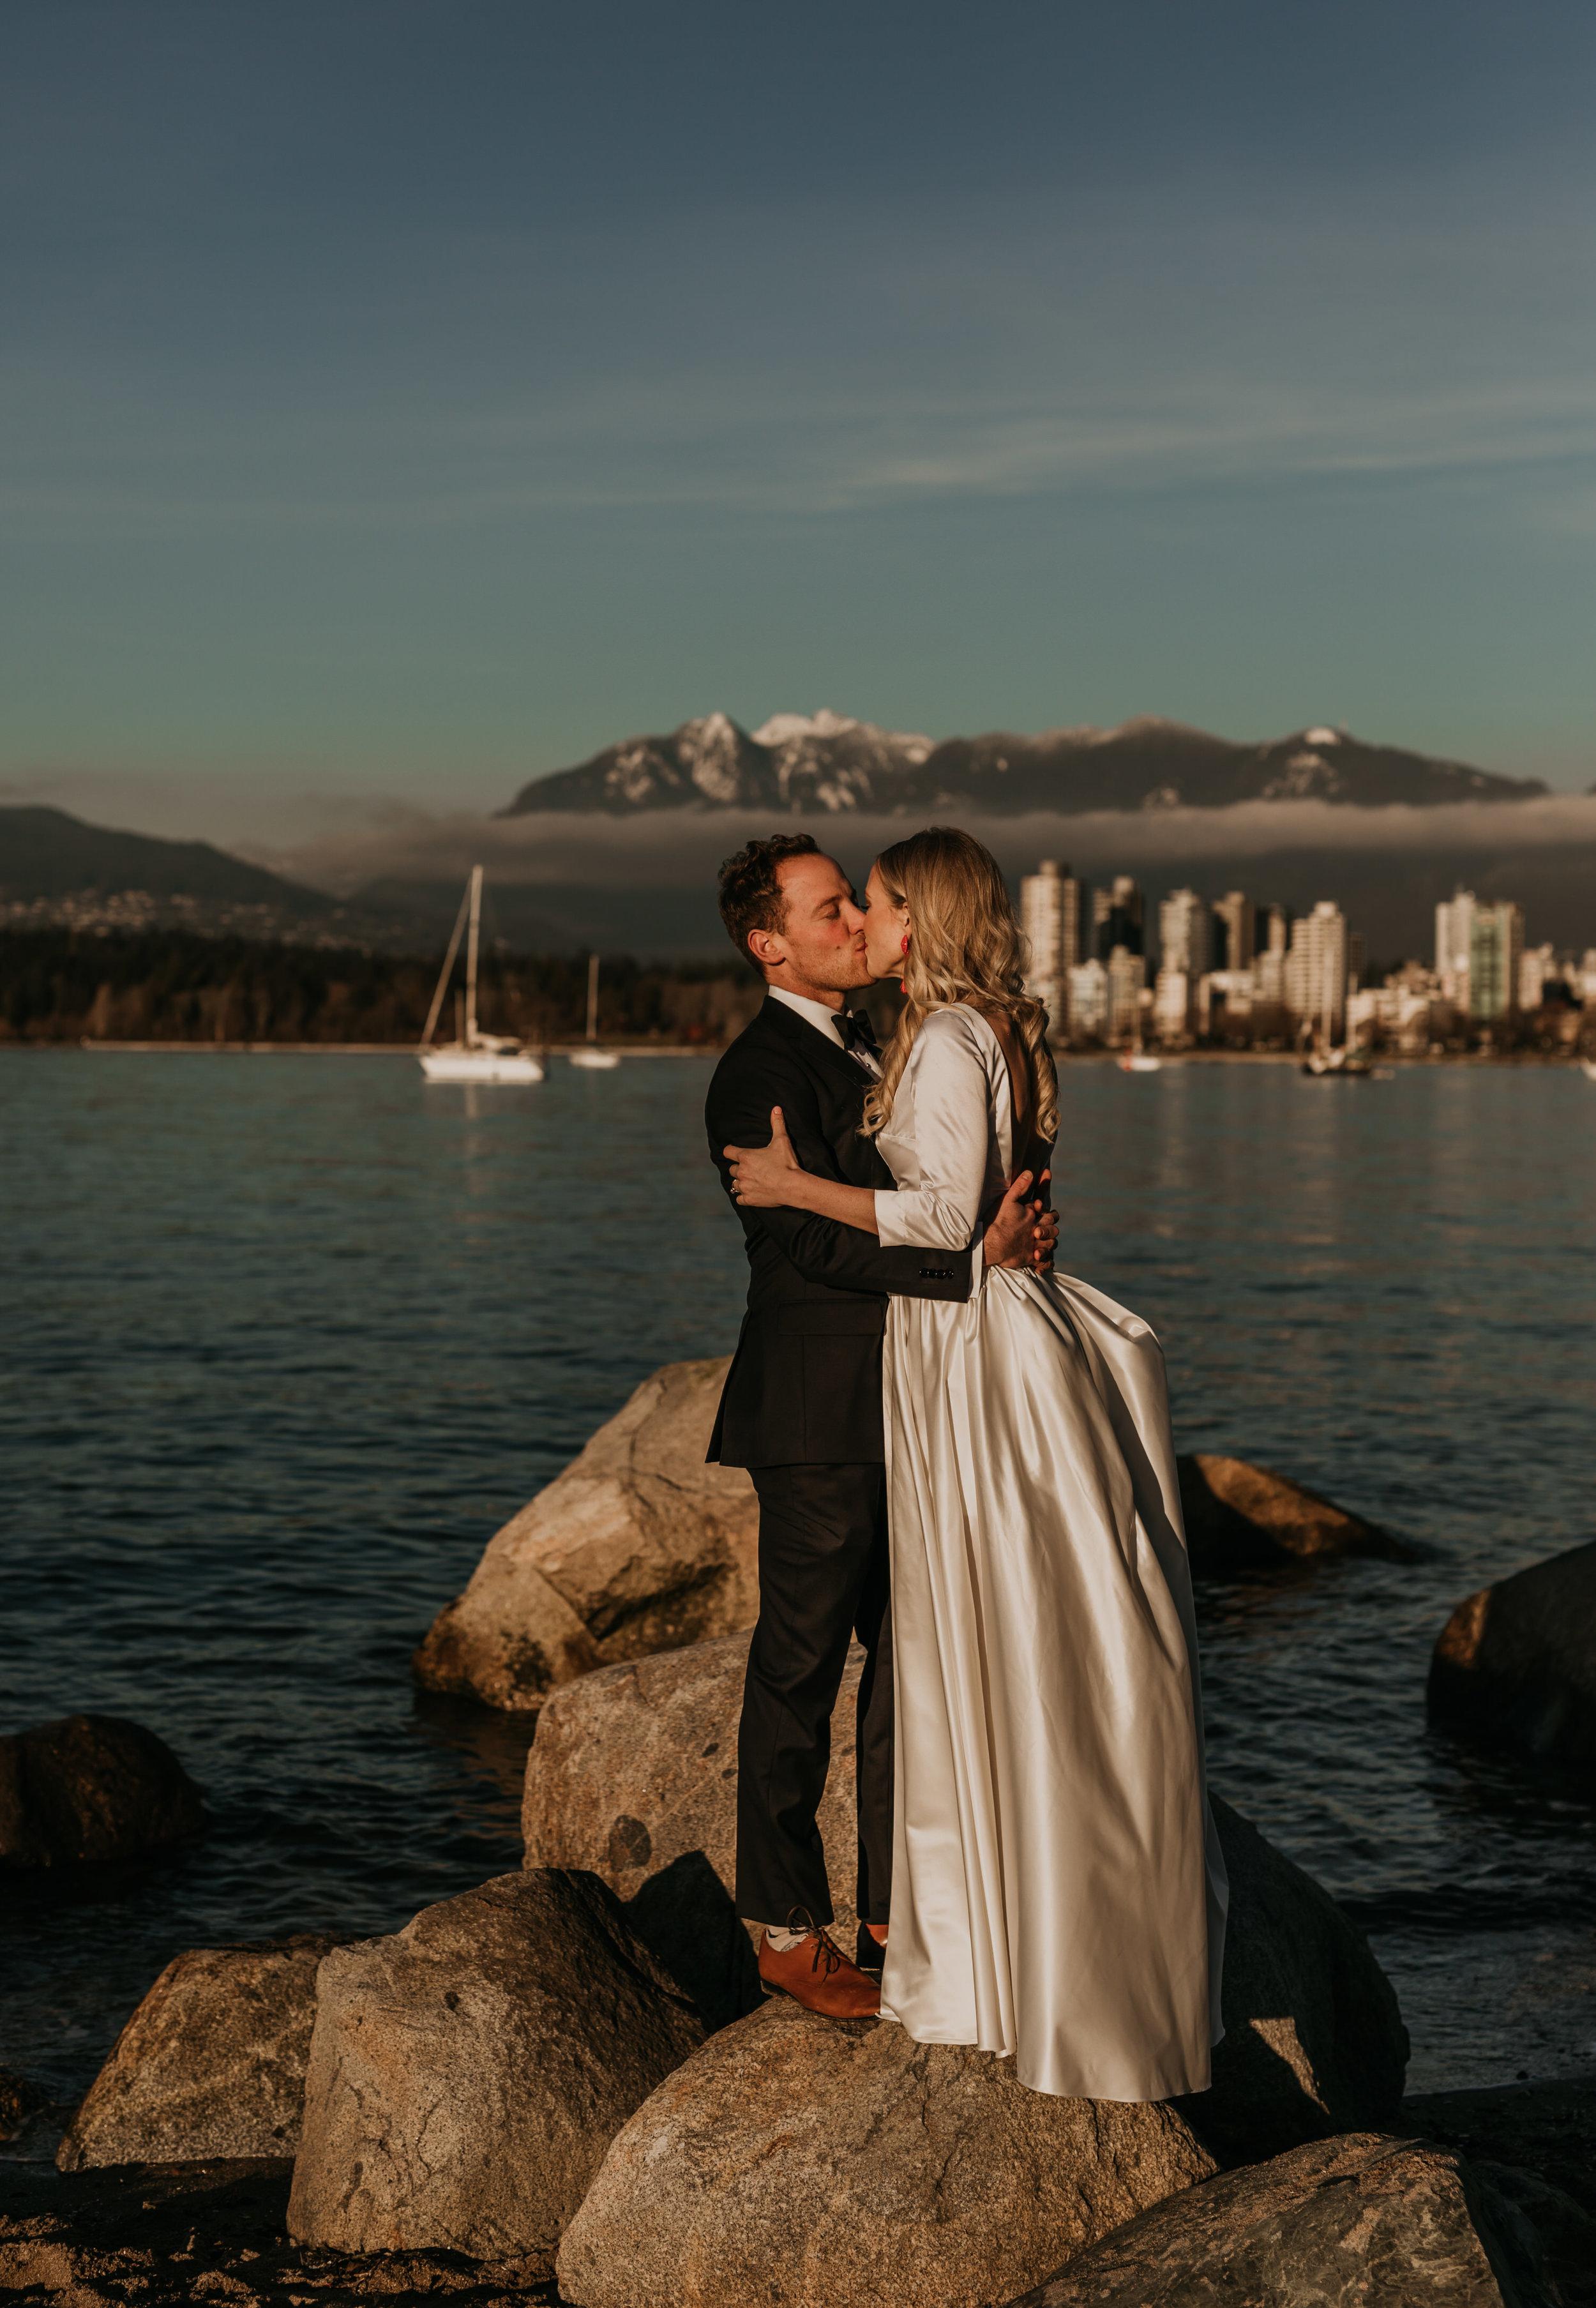 Vancouver Wedding Photos - Vegan Wedding Photographer - New Years Eve Wedding Photos - Vancouver Wedding Photographer - Vancouver Wedding Videographer - 615.JPG